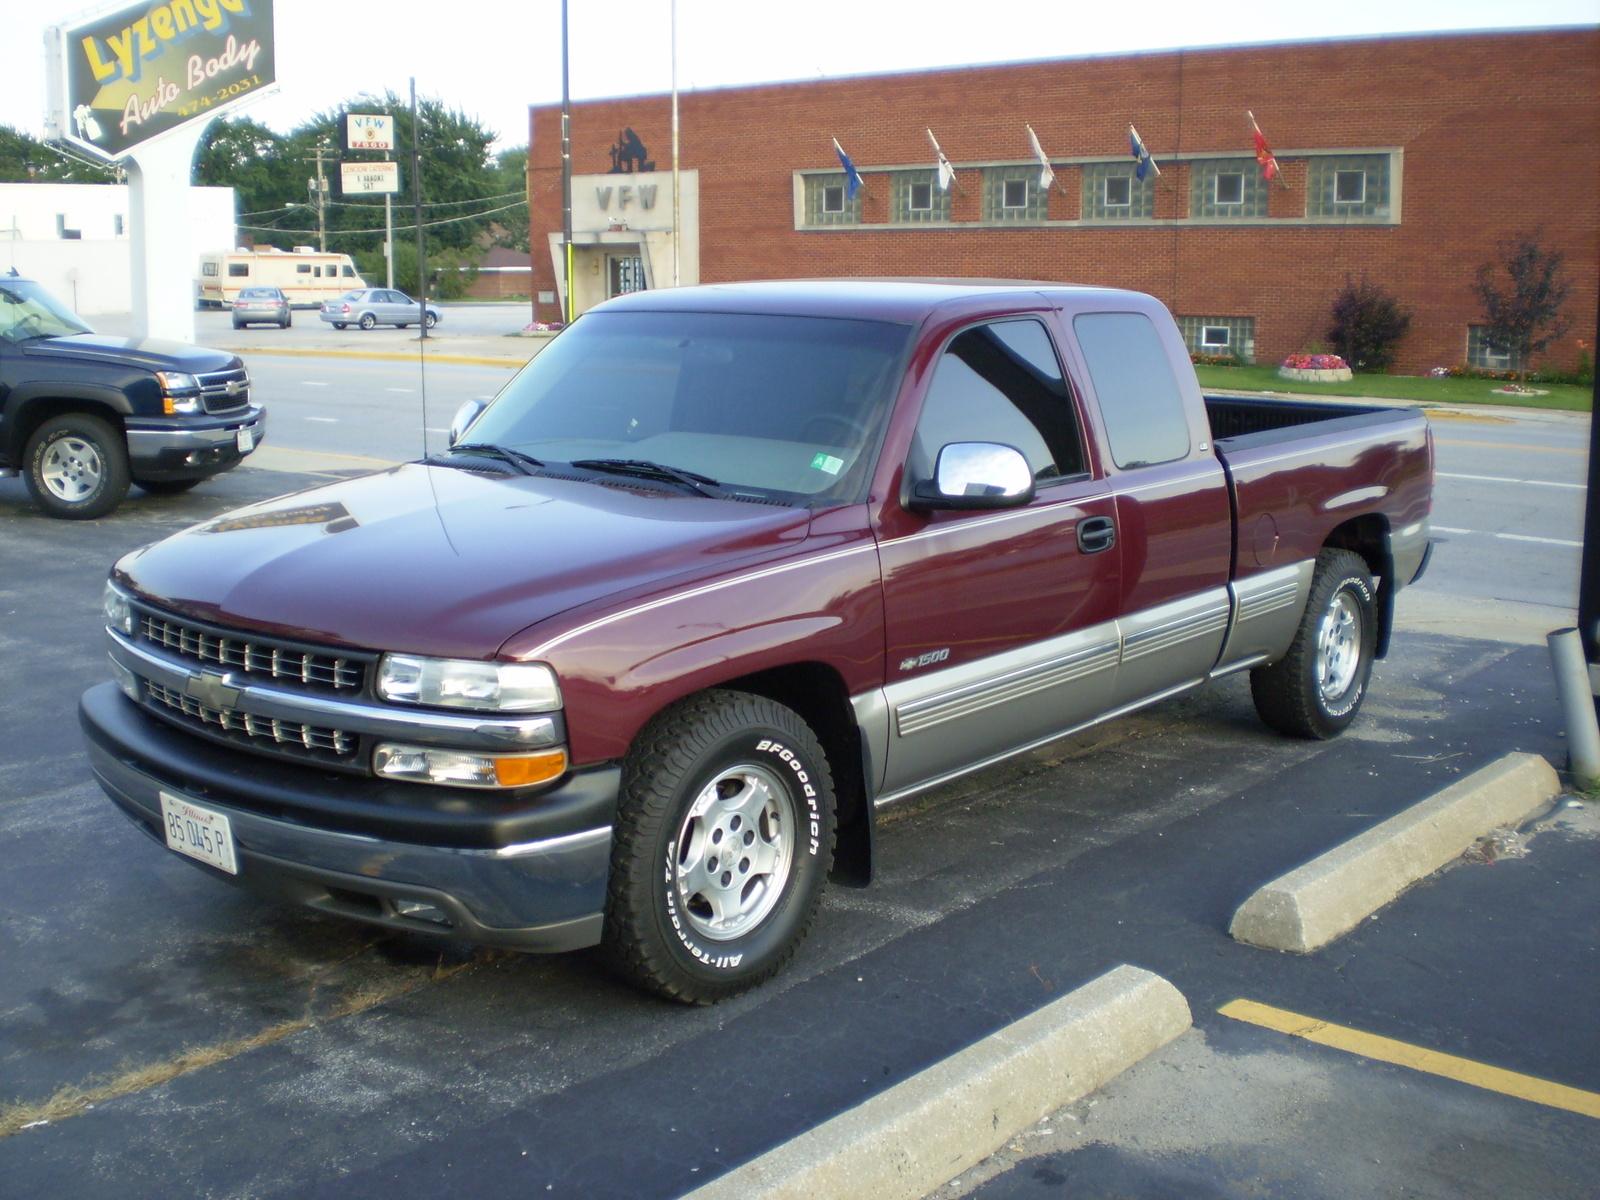 2000 Chevrolet Silverado 1500 Exterior Pictures Cargurus